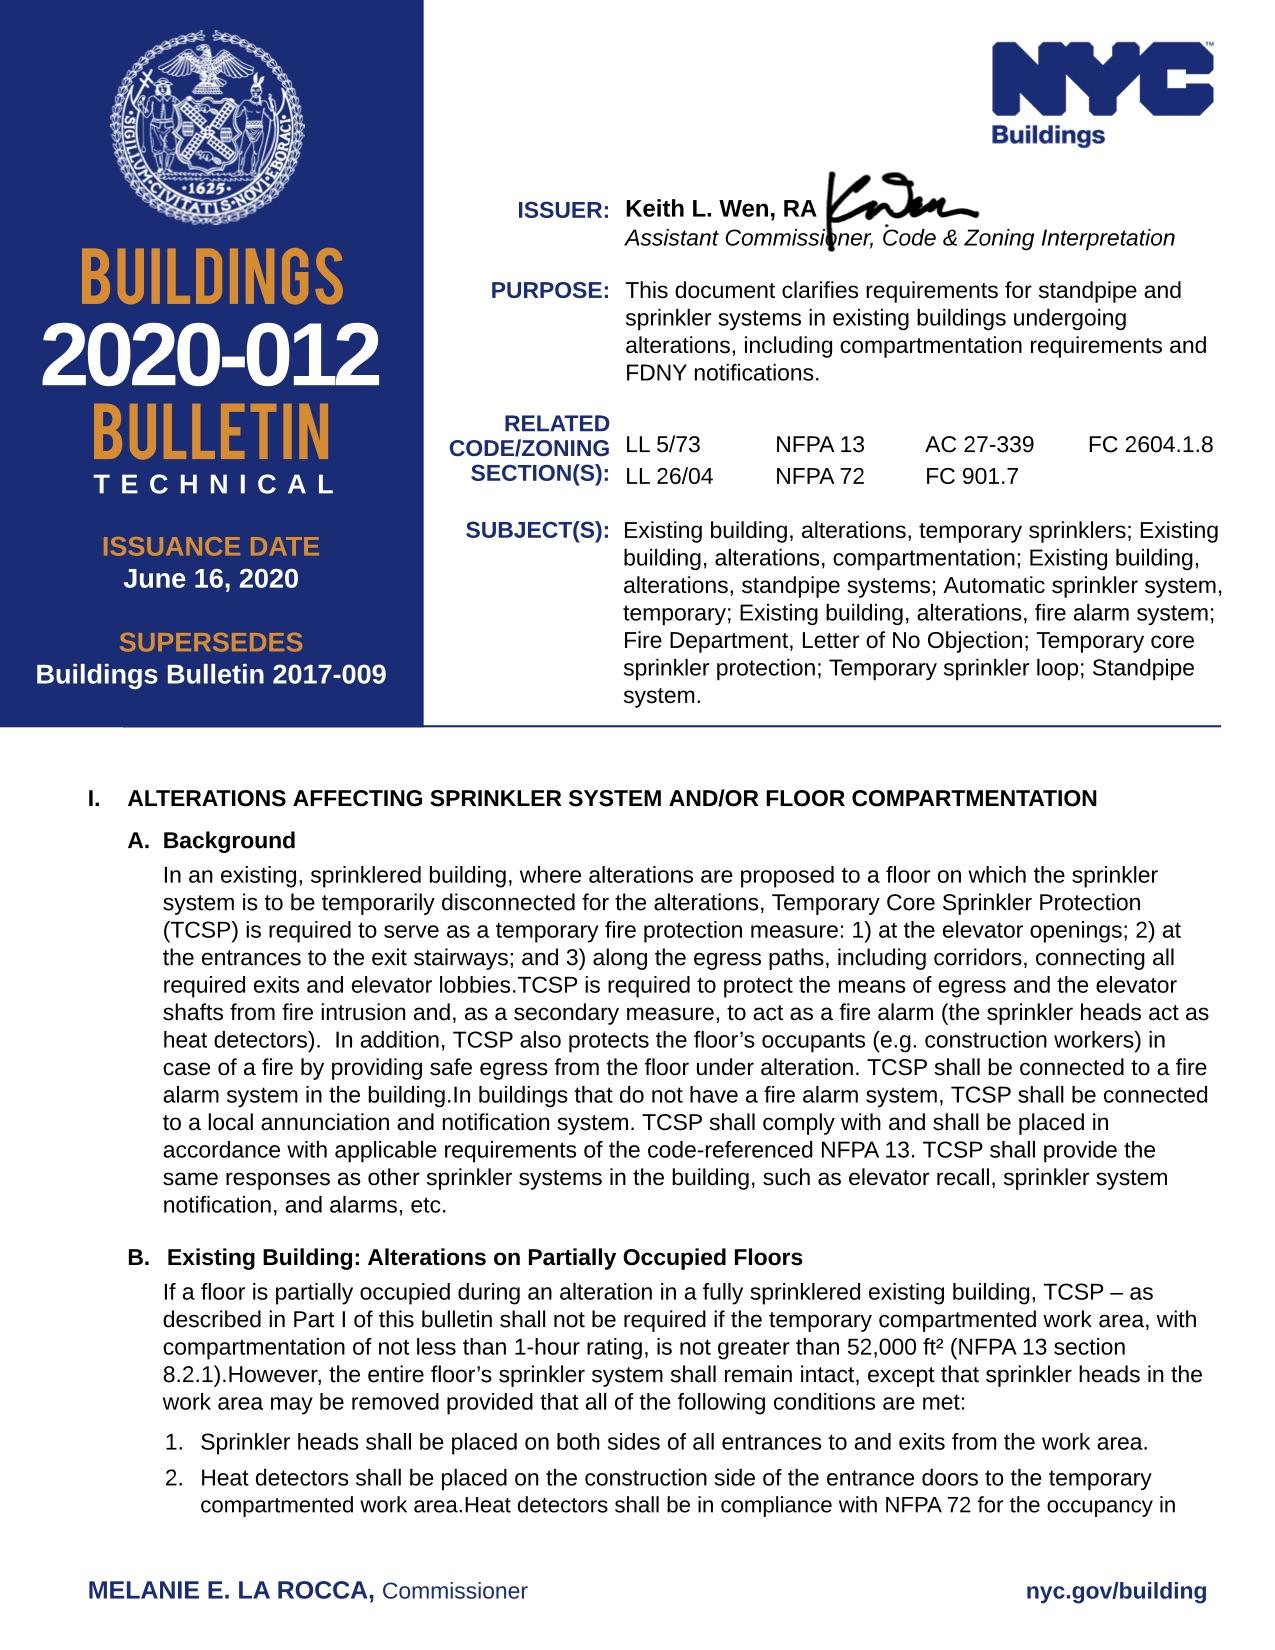 BUILDINGS 2020-012 BULLETIN TECHNICAL